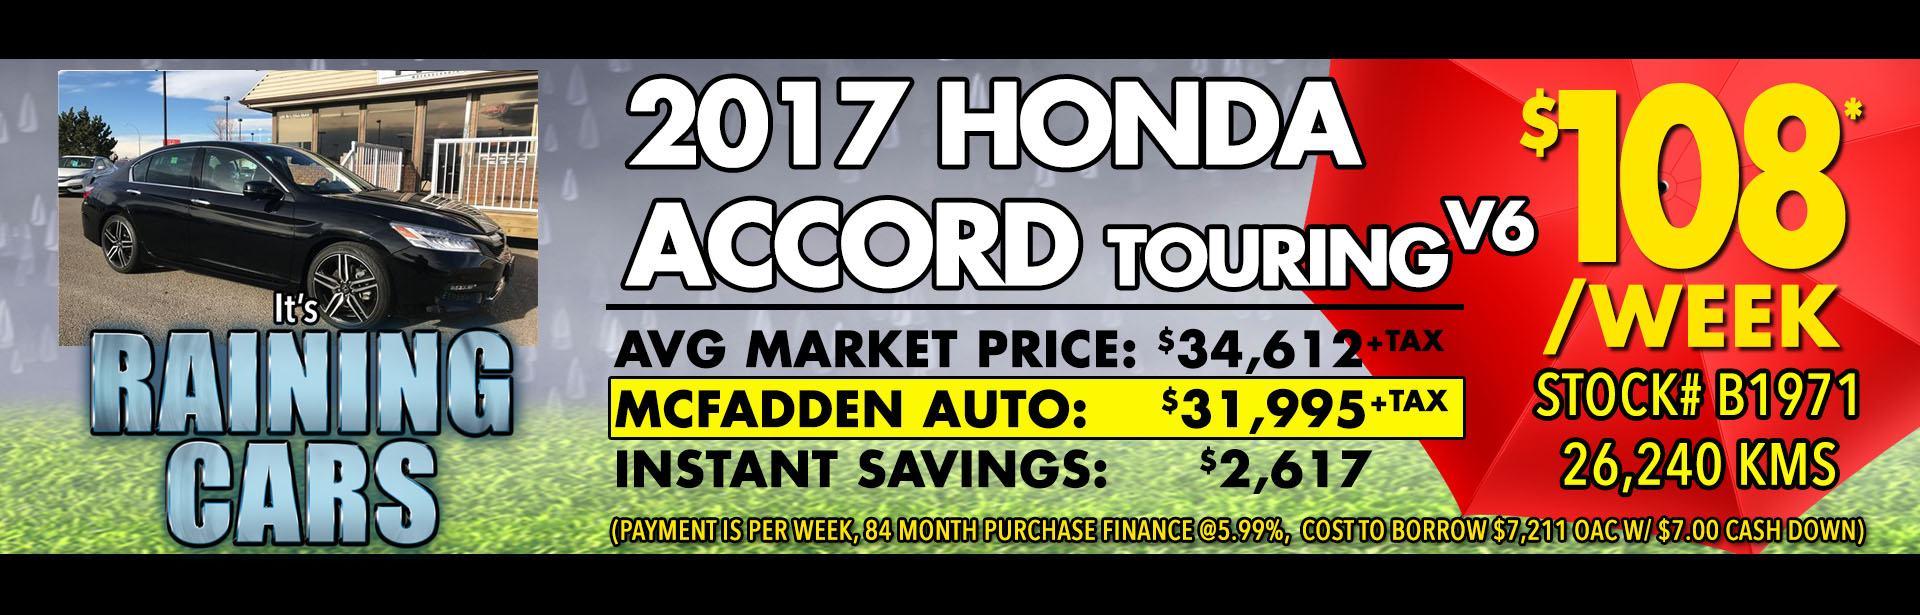 Raining cars - B1971 2017 Honda Accord Touring V6 - APR 2018